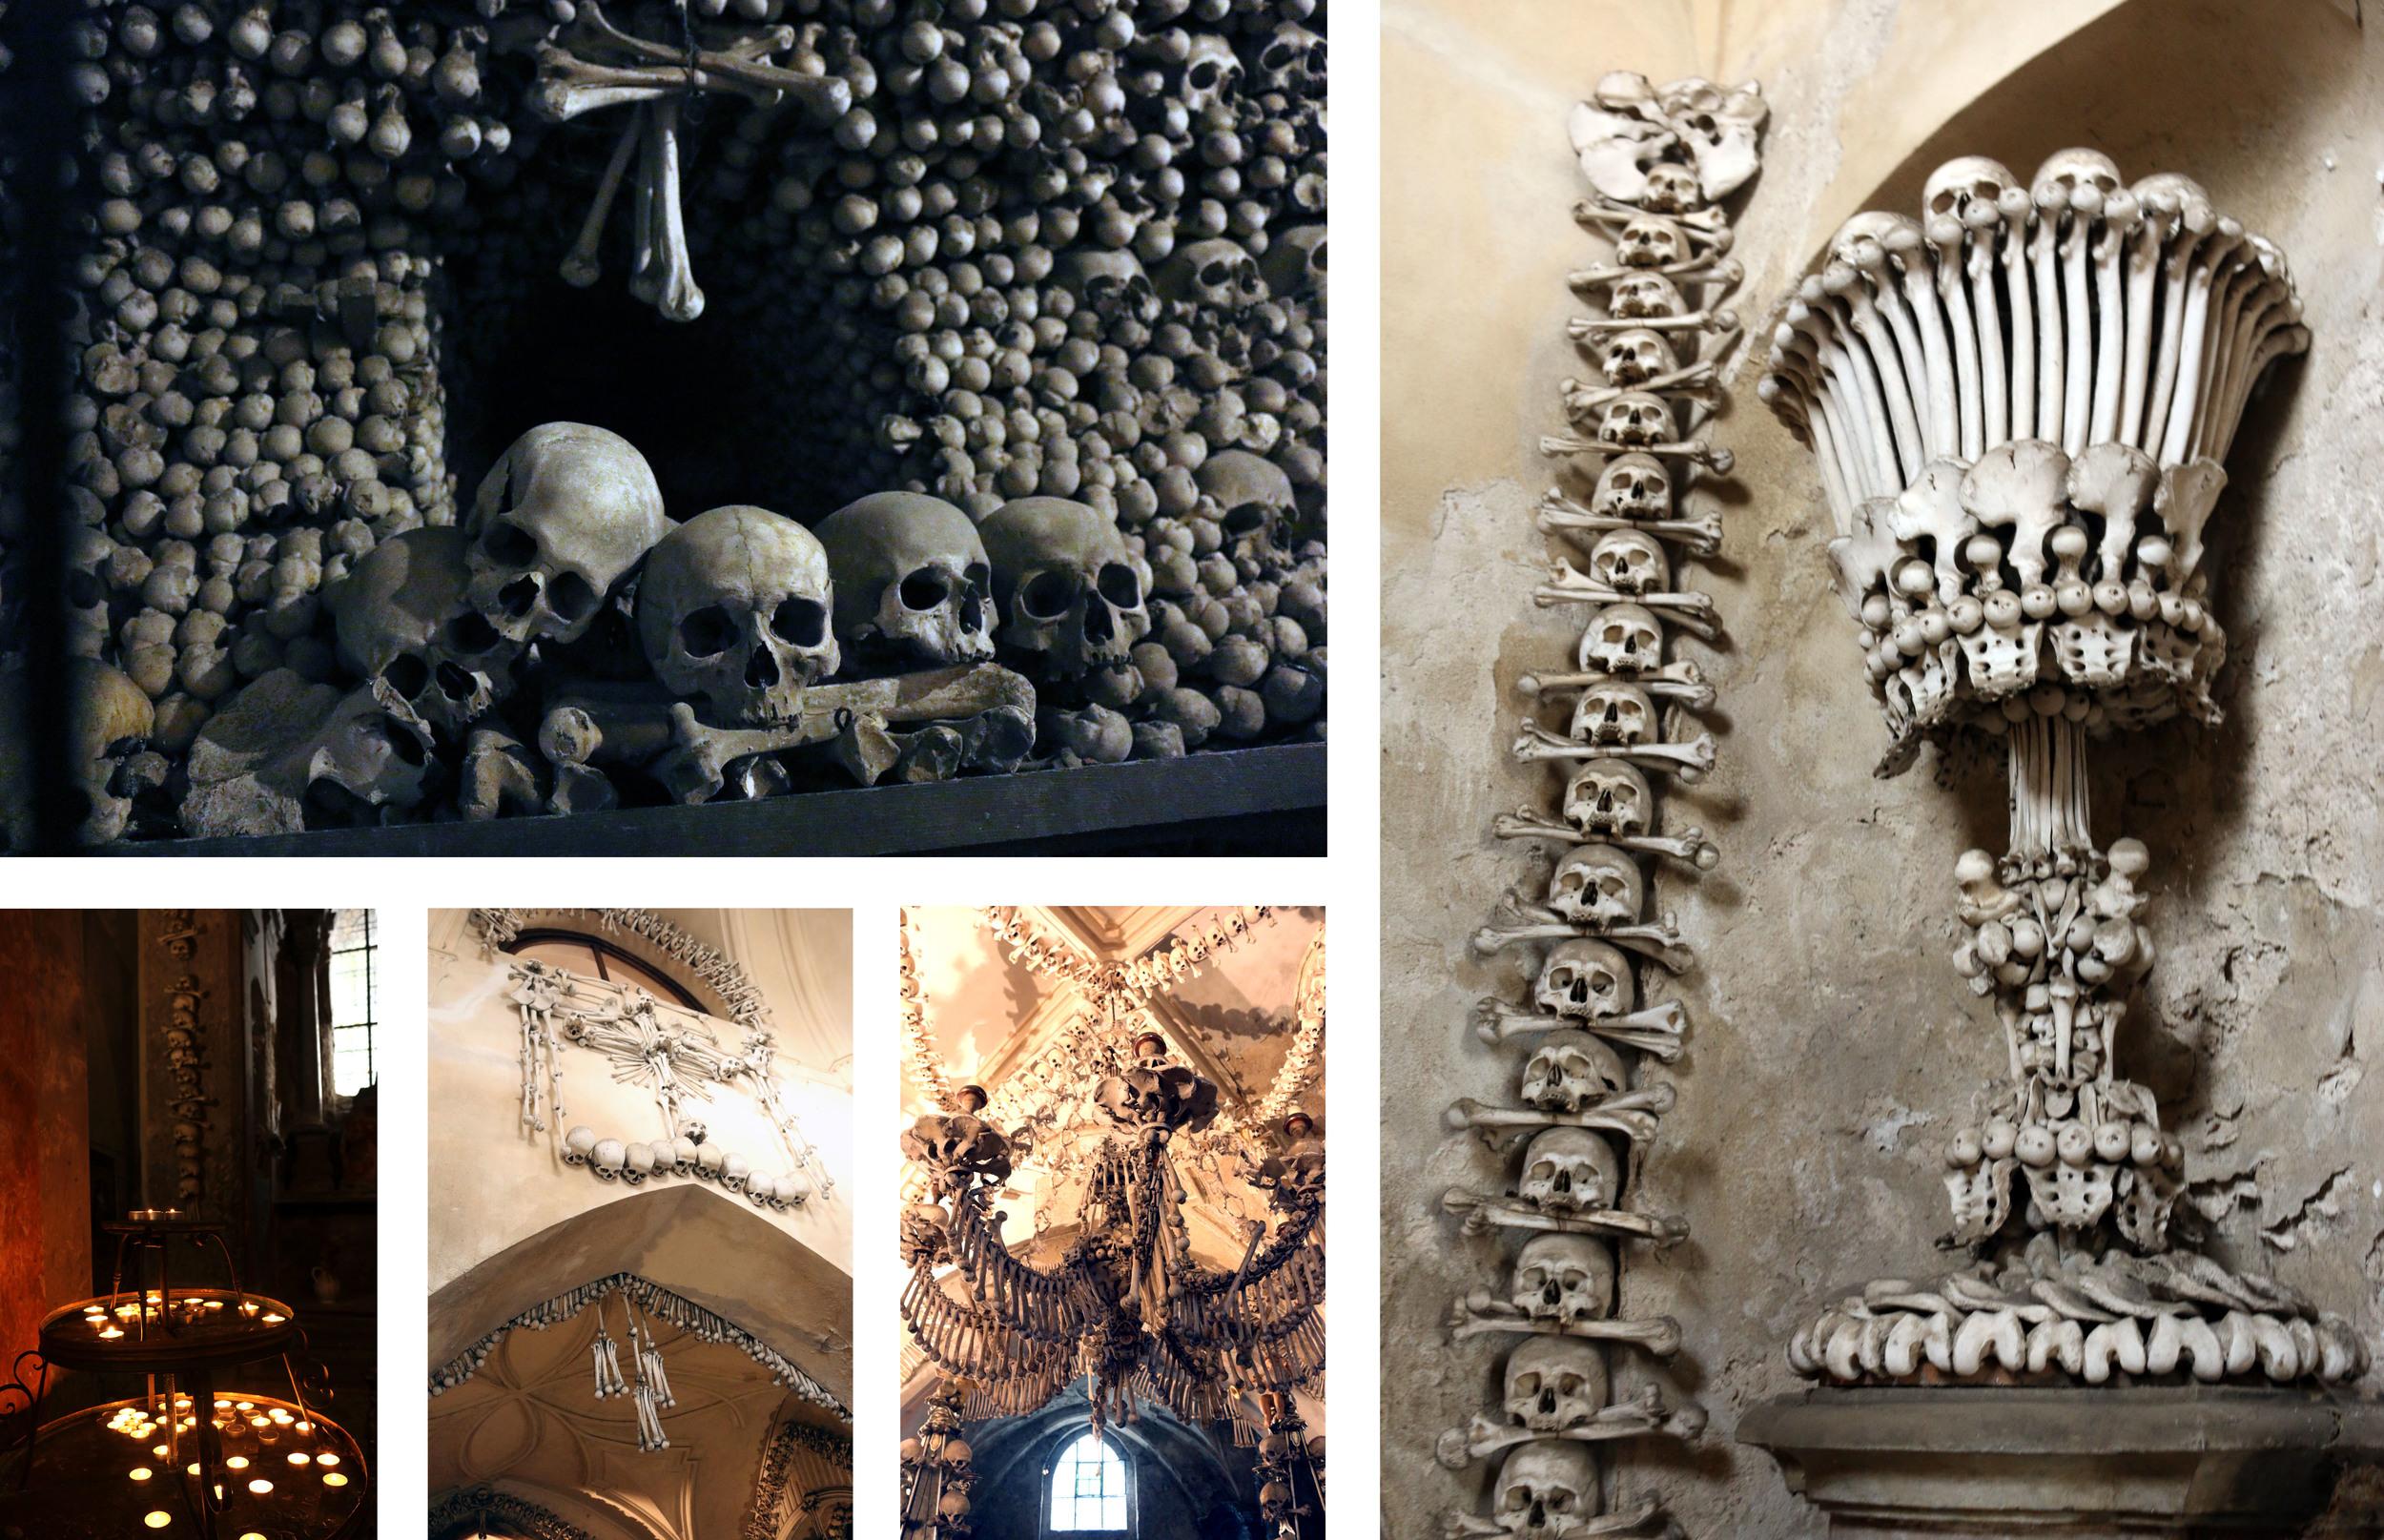 The Sedlec Ossuary, look at all dem bones.